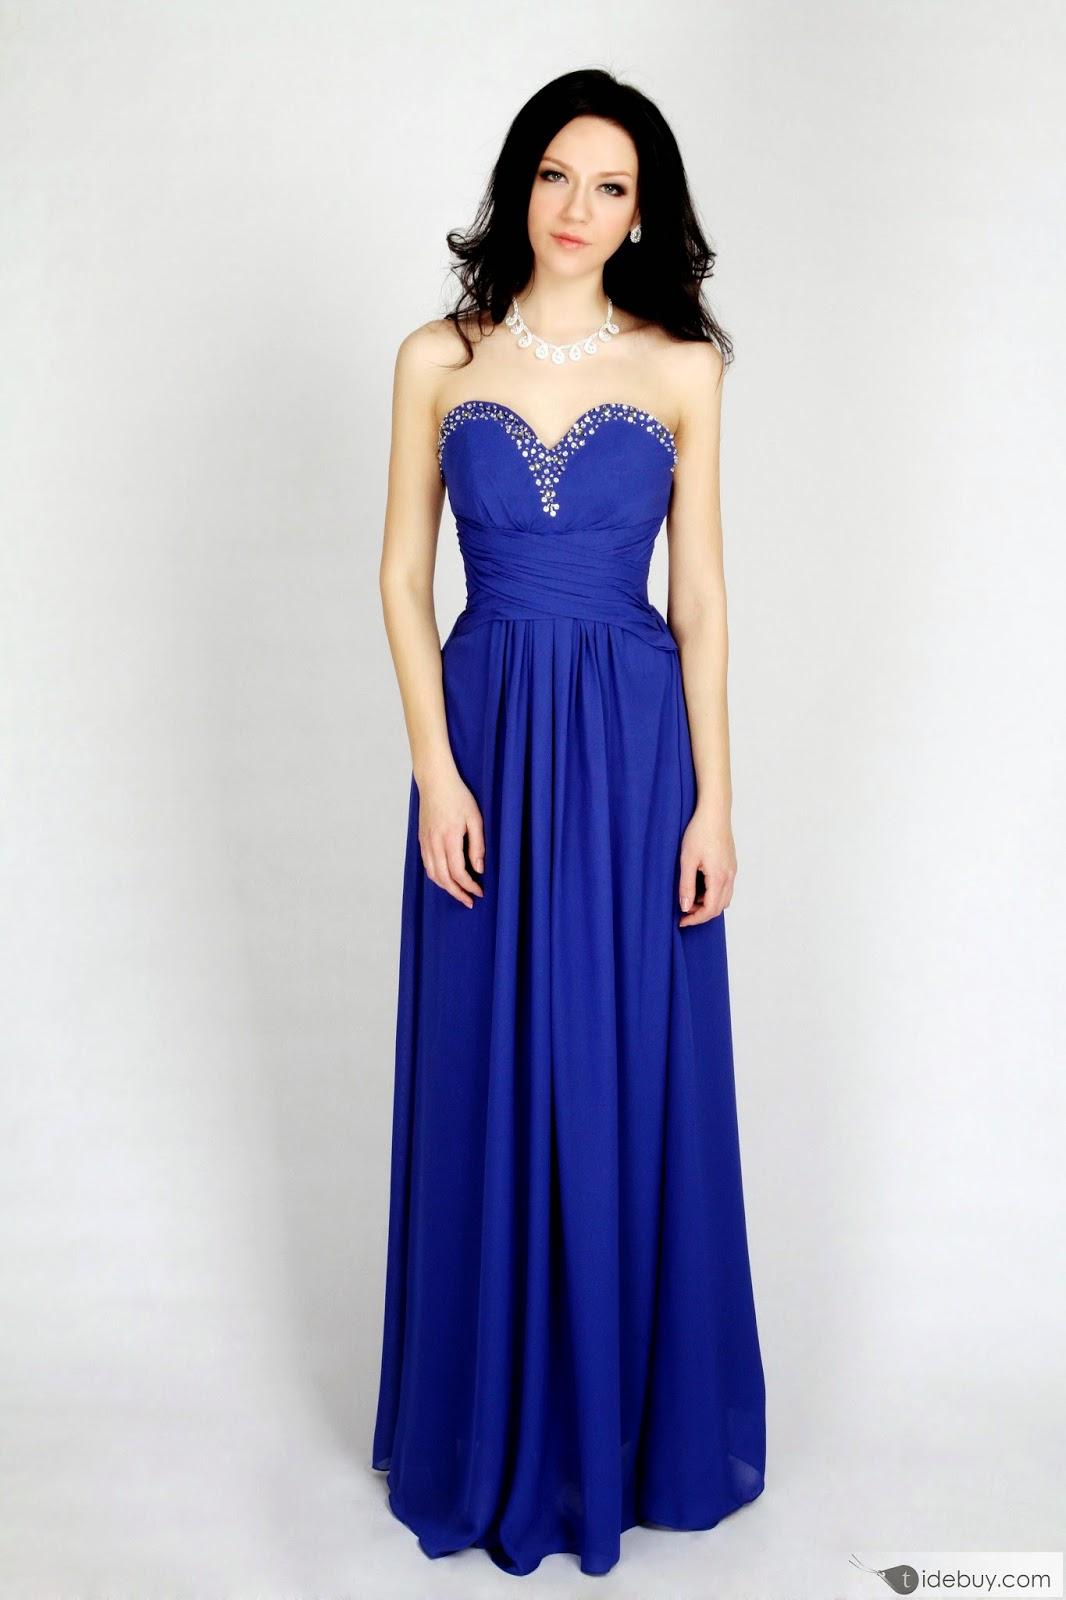 Lluvia de ideas peinados para vestidos escotados dela espalda Fotos de ideas de color de pelo - Asombrosos vestidos de fiesta escotados   Moda 2014 ...